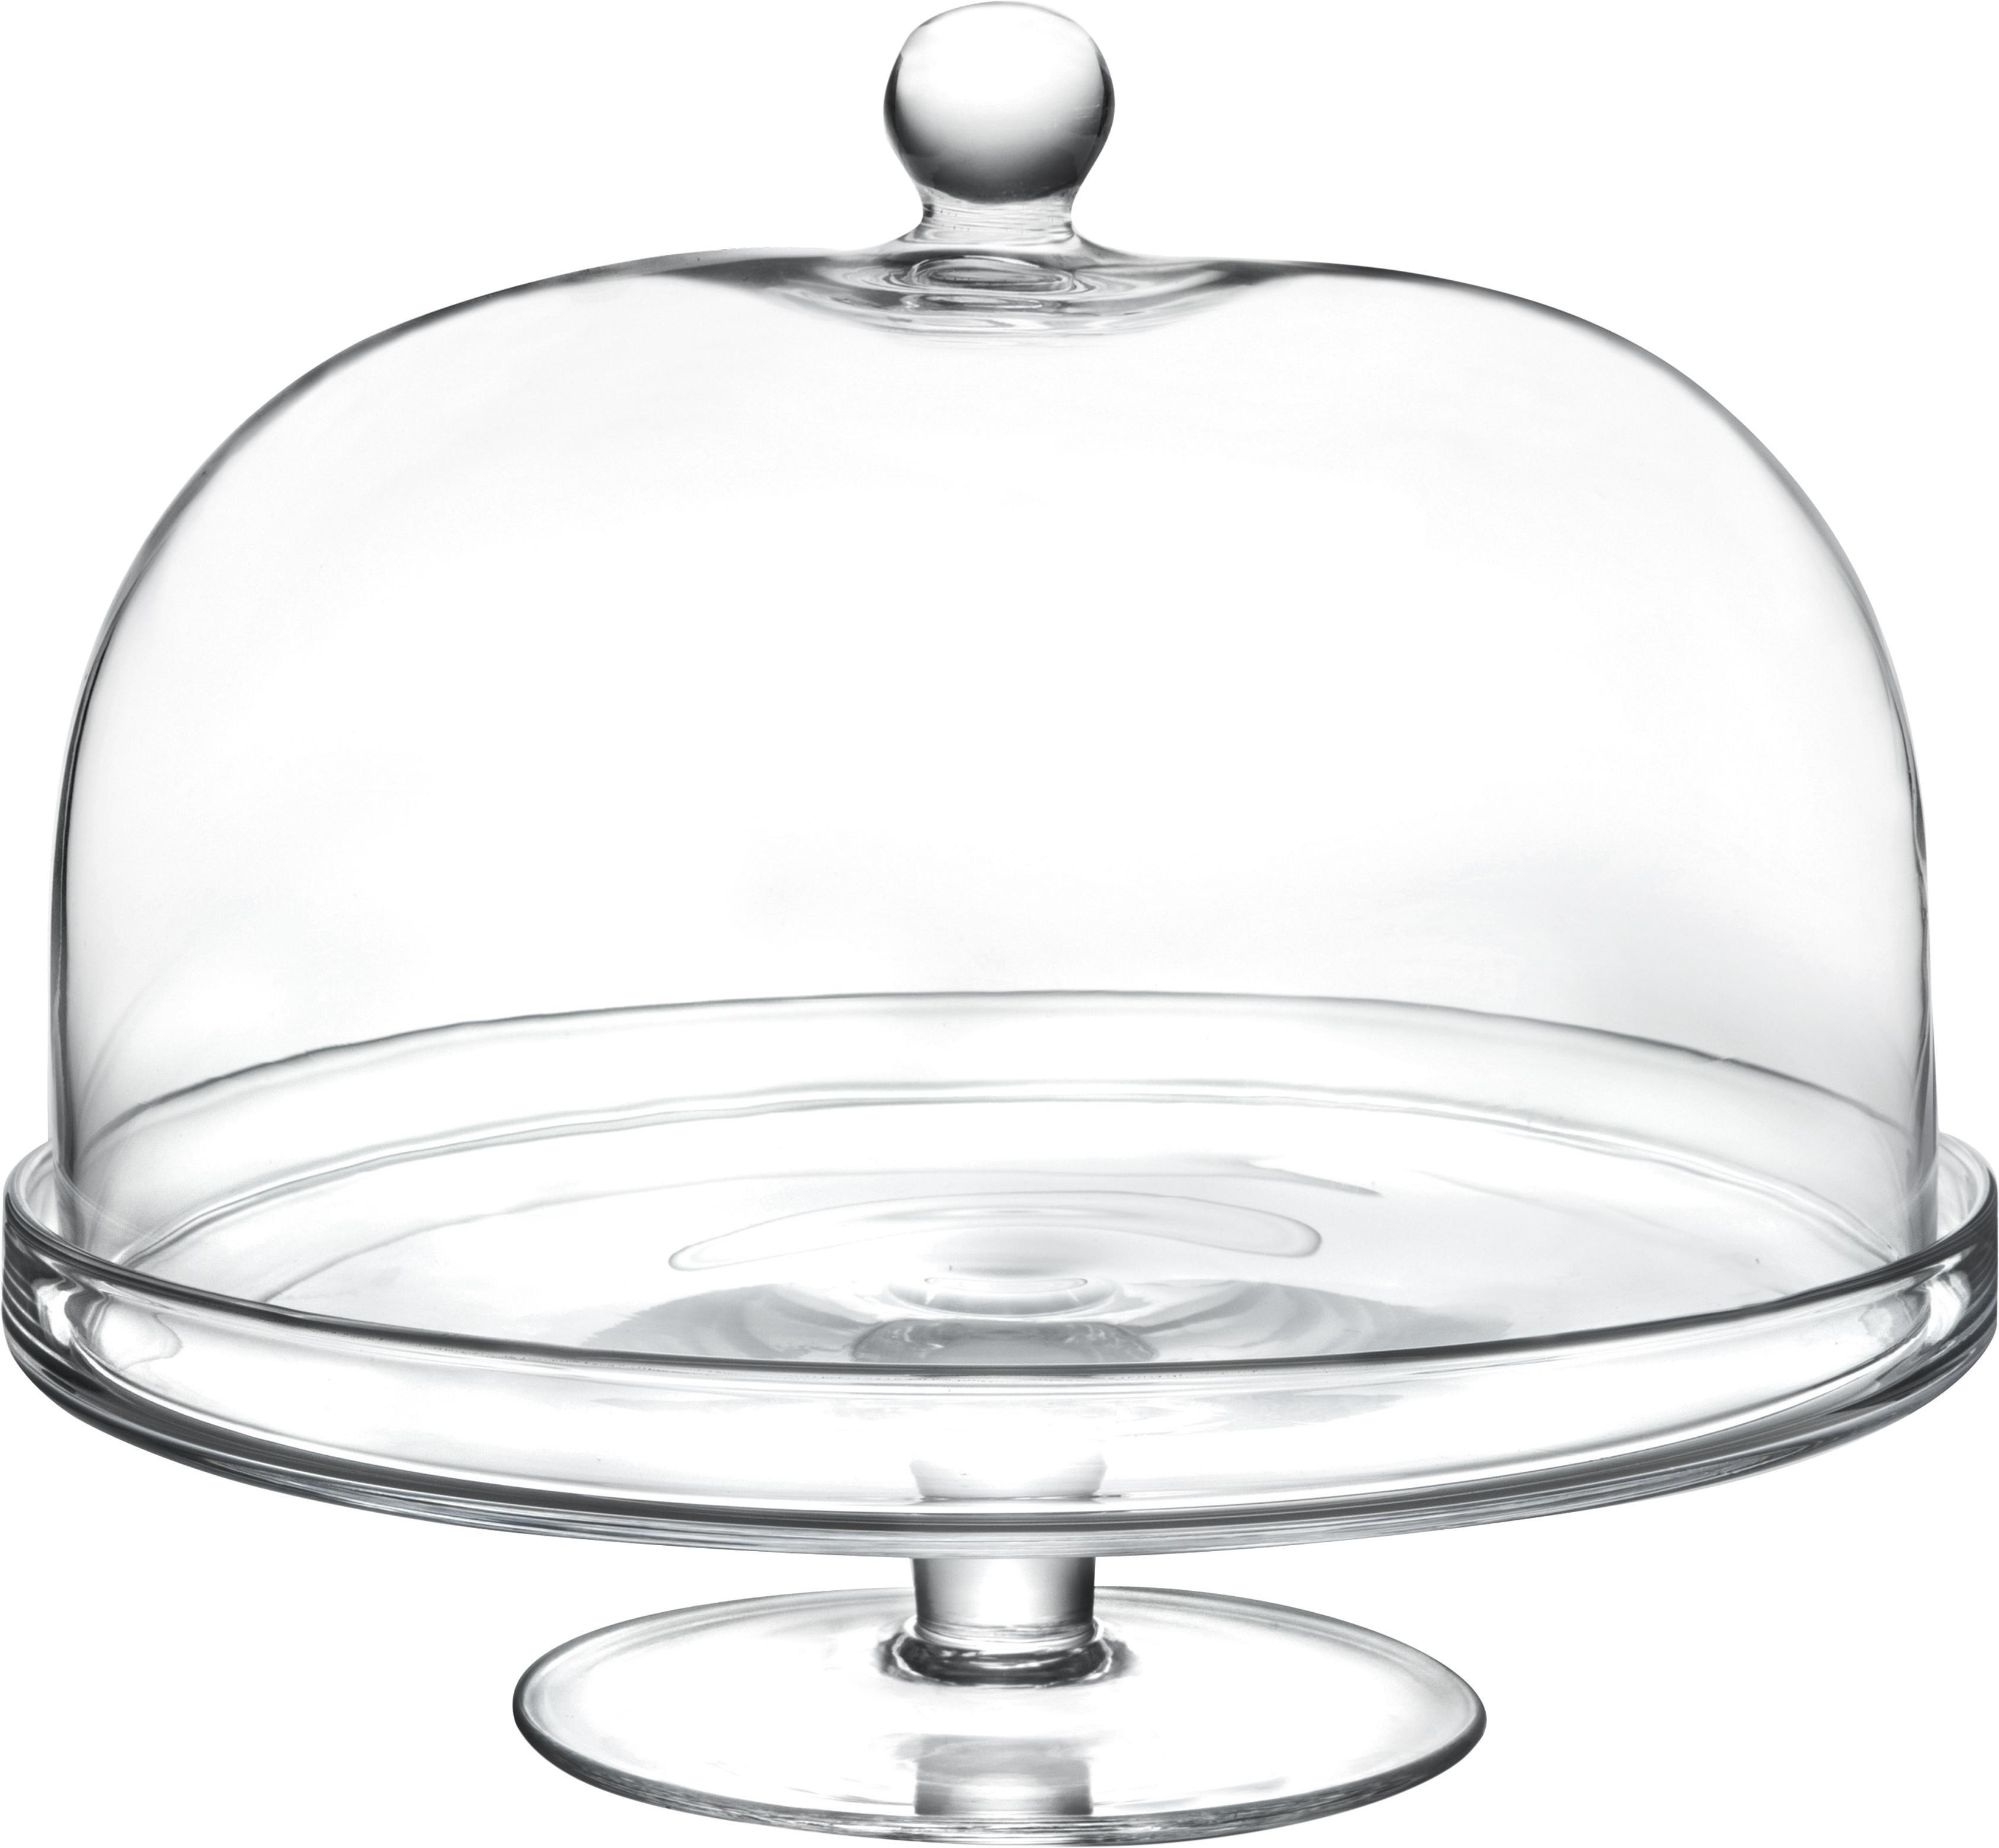 Kristallen taartplaat Lia, Luxion kristalglas, Transparant, Ø 30 x H 26 cm